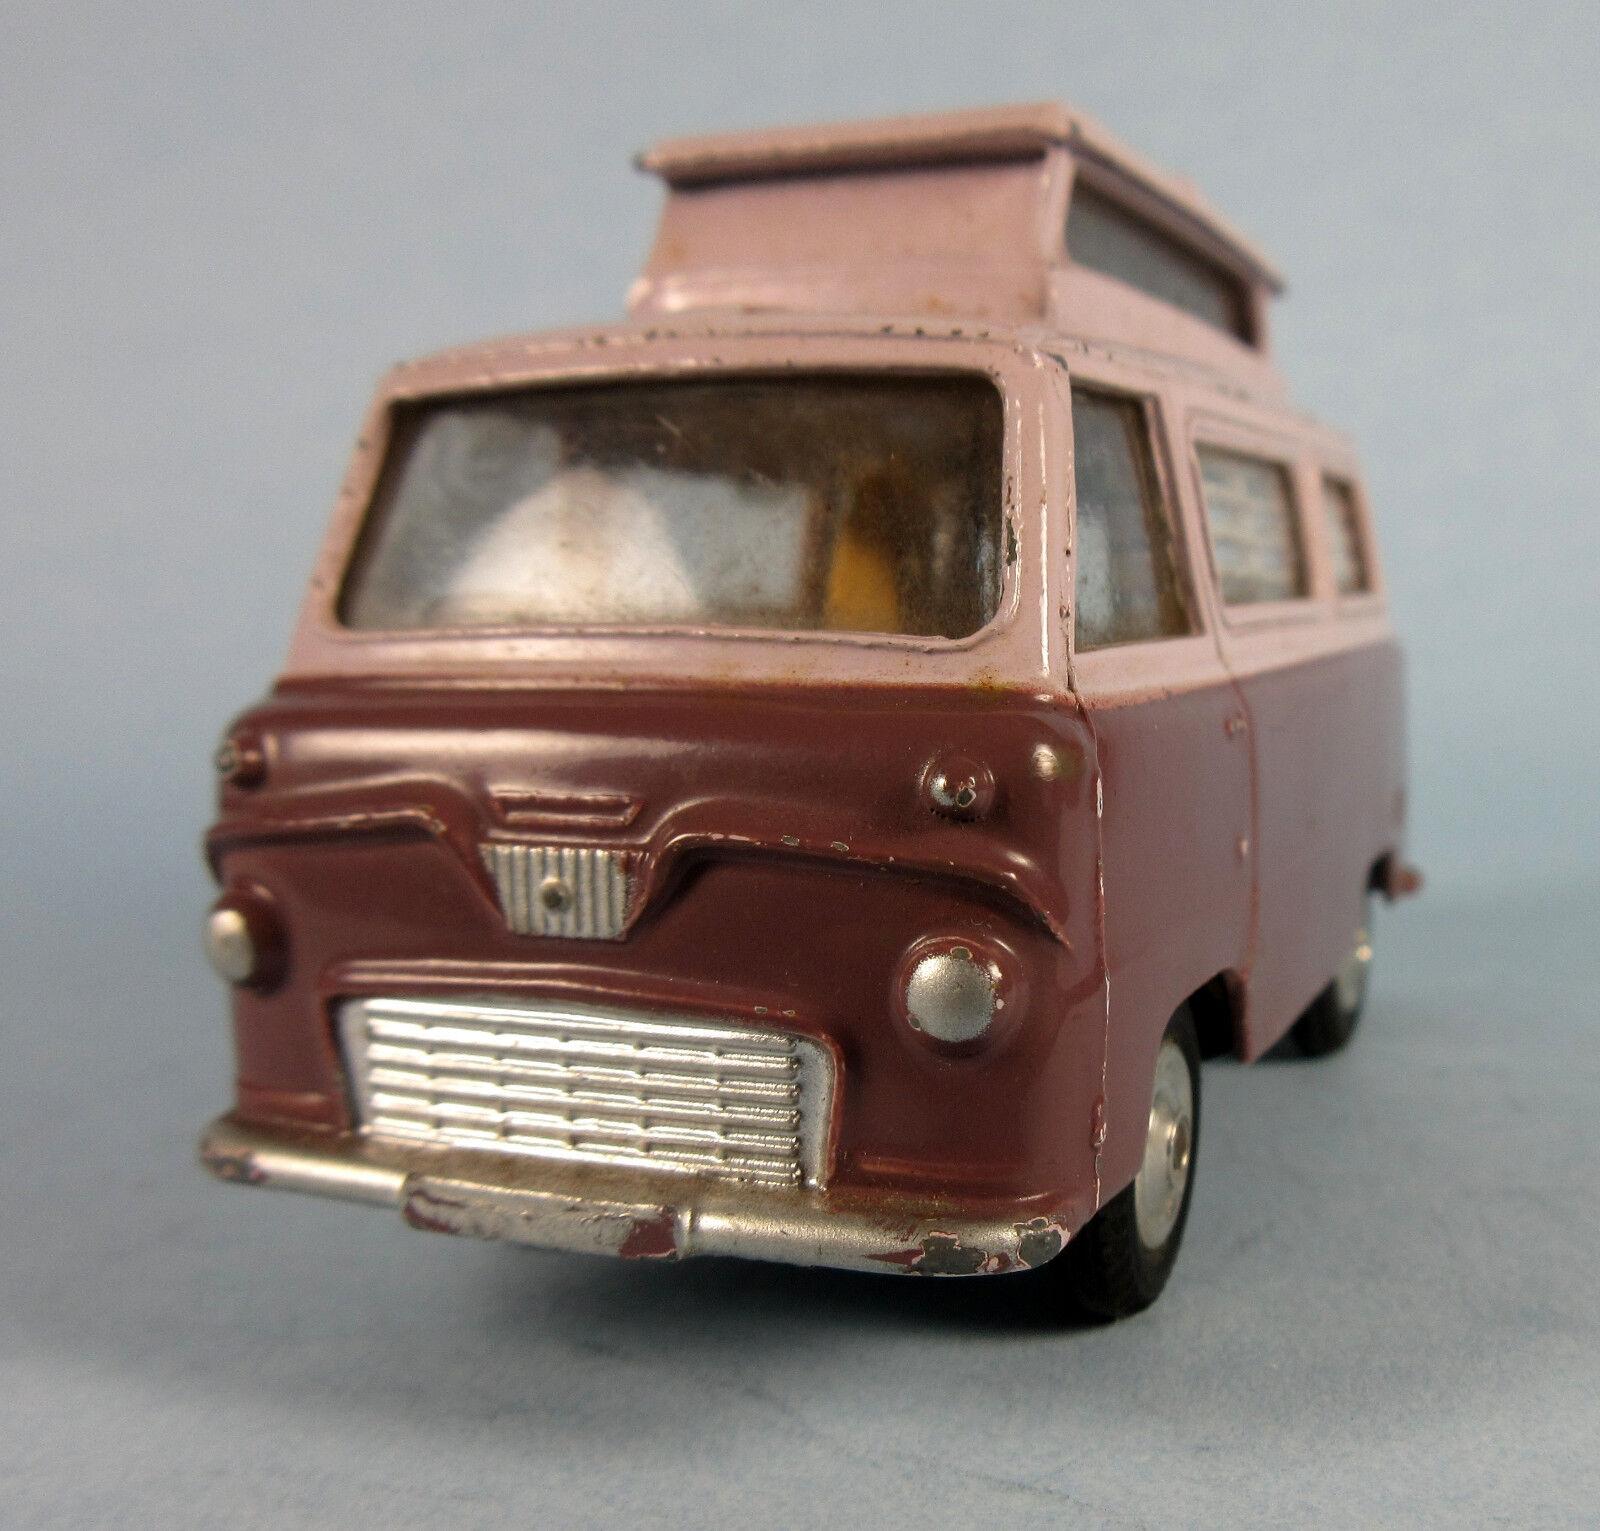 CORGI Ford Thames Caravan No. 420 (Mauve) 1 43 Scale Diecast Model RARE